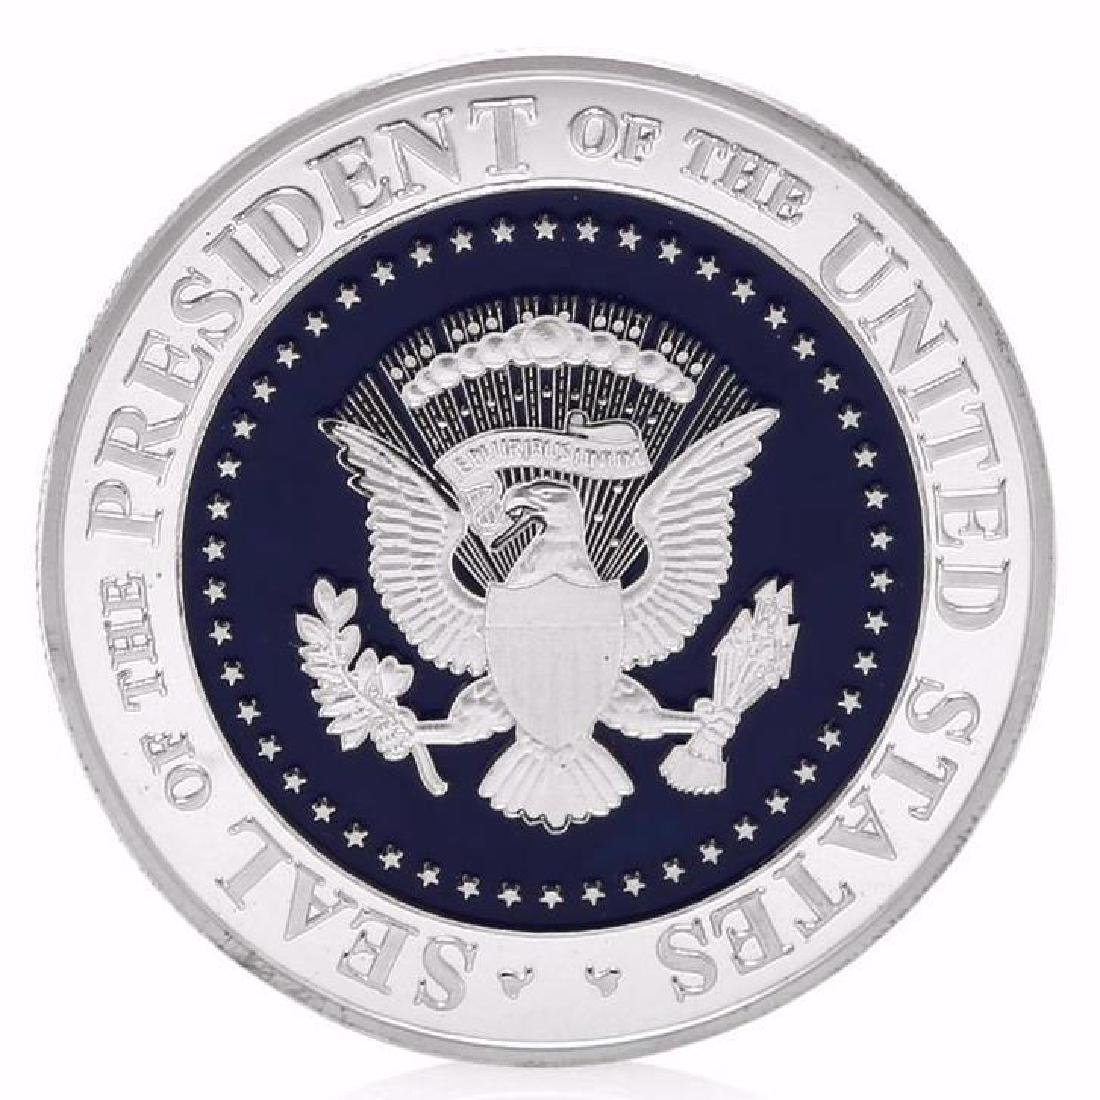 Donald Trump 45th President Silver Clad Coin - 2